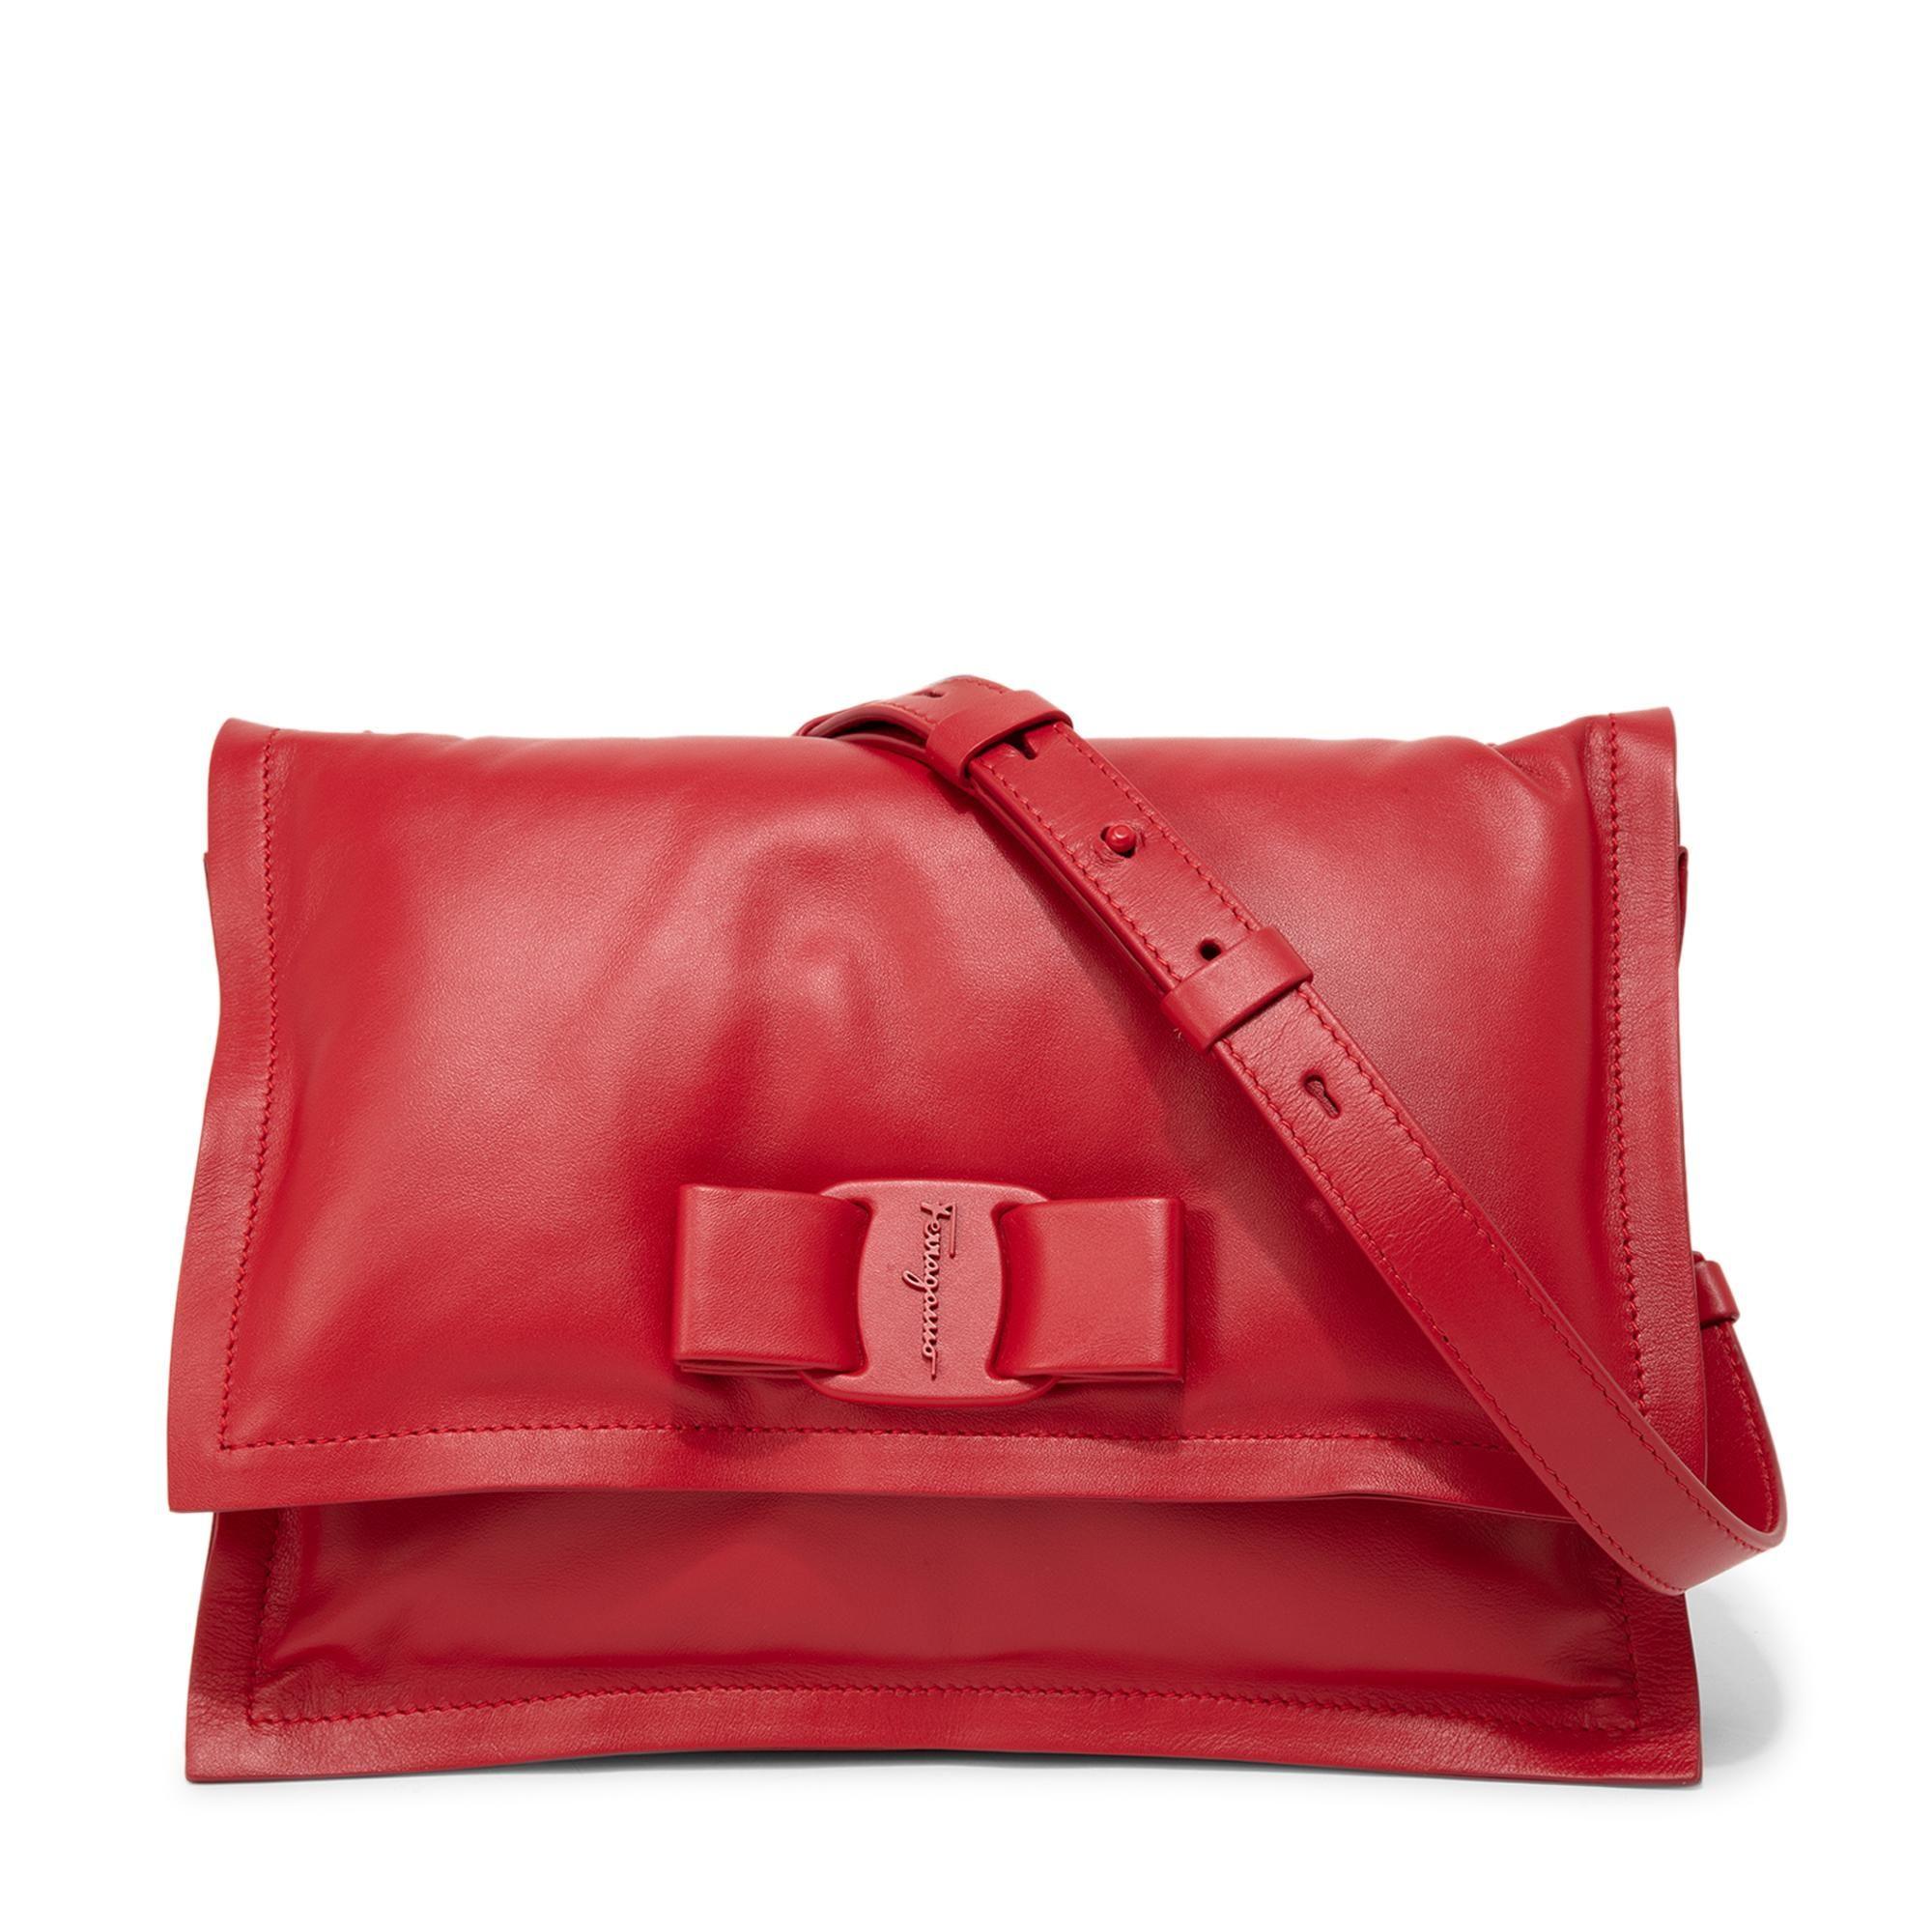 Viva Bow small shoulder bag